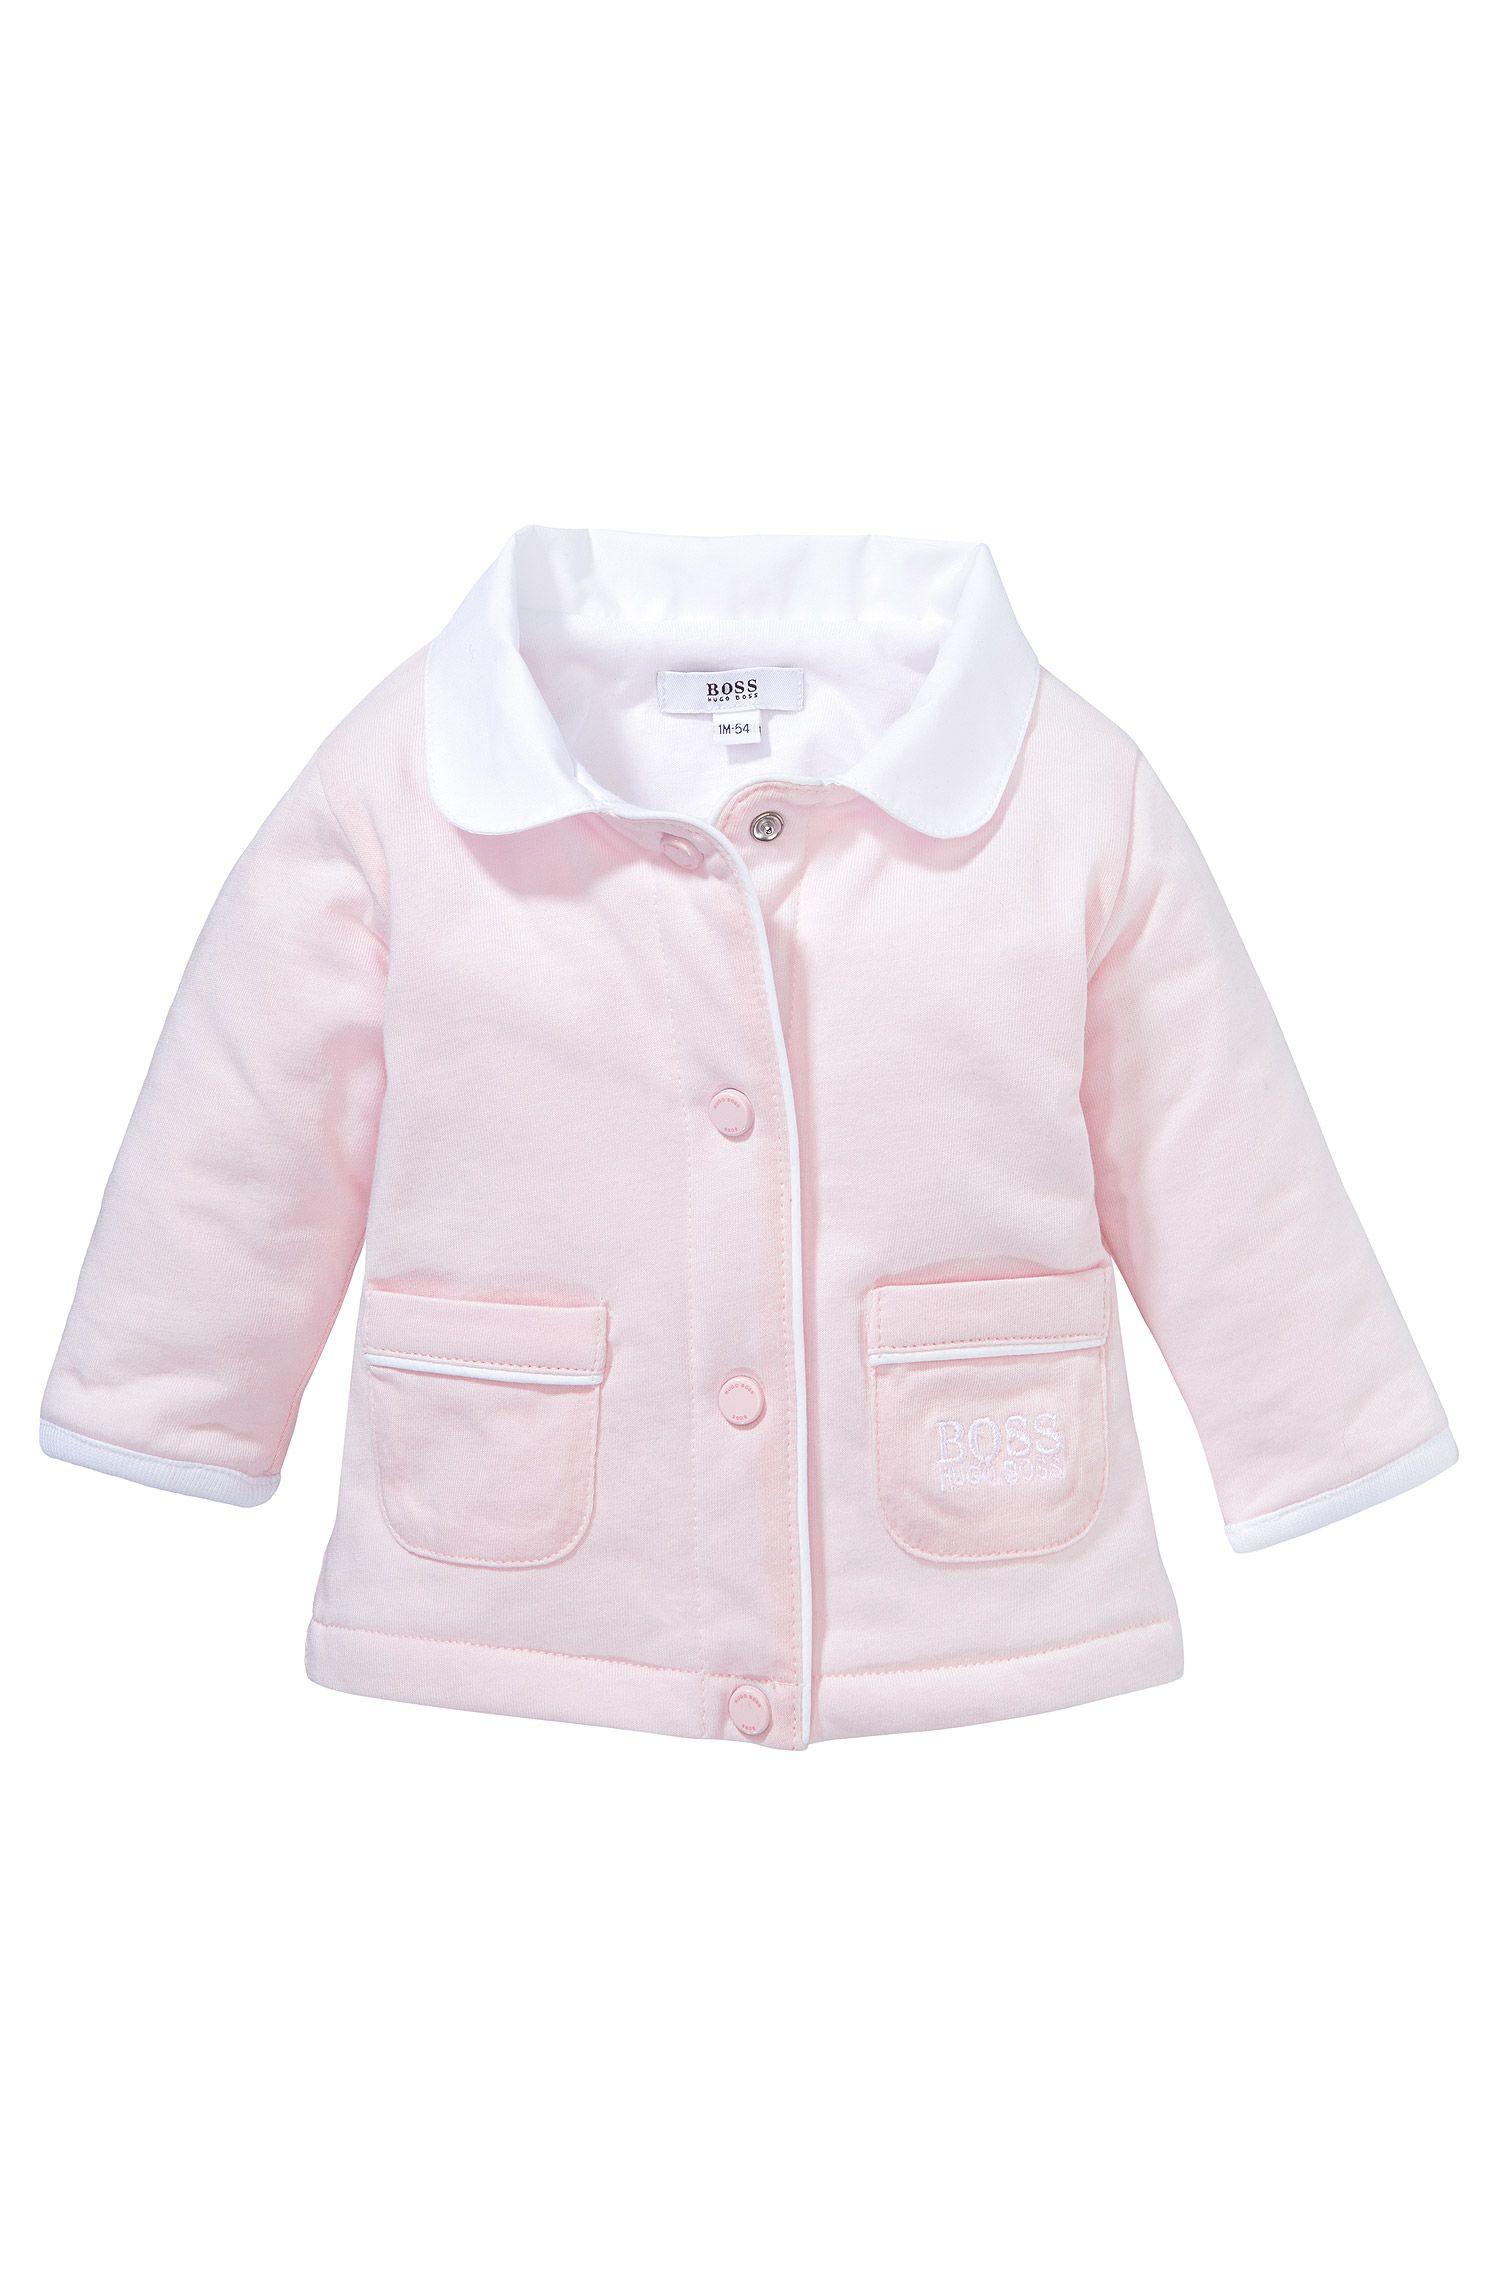 Kids-Sweatshirt-Jacke ´J95153` aus Baumwolle